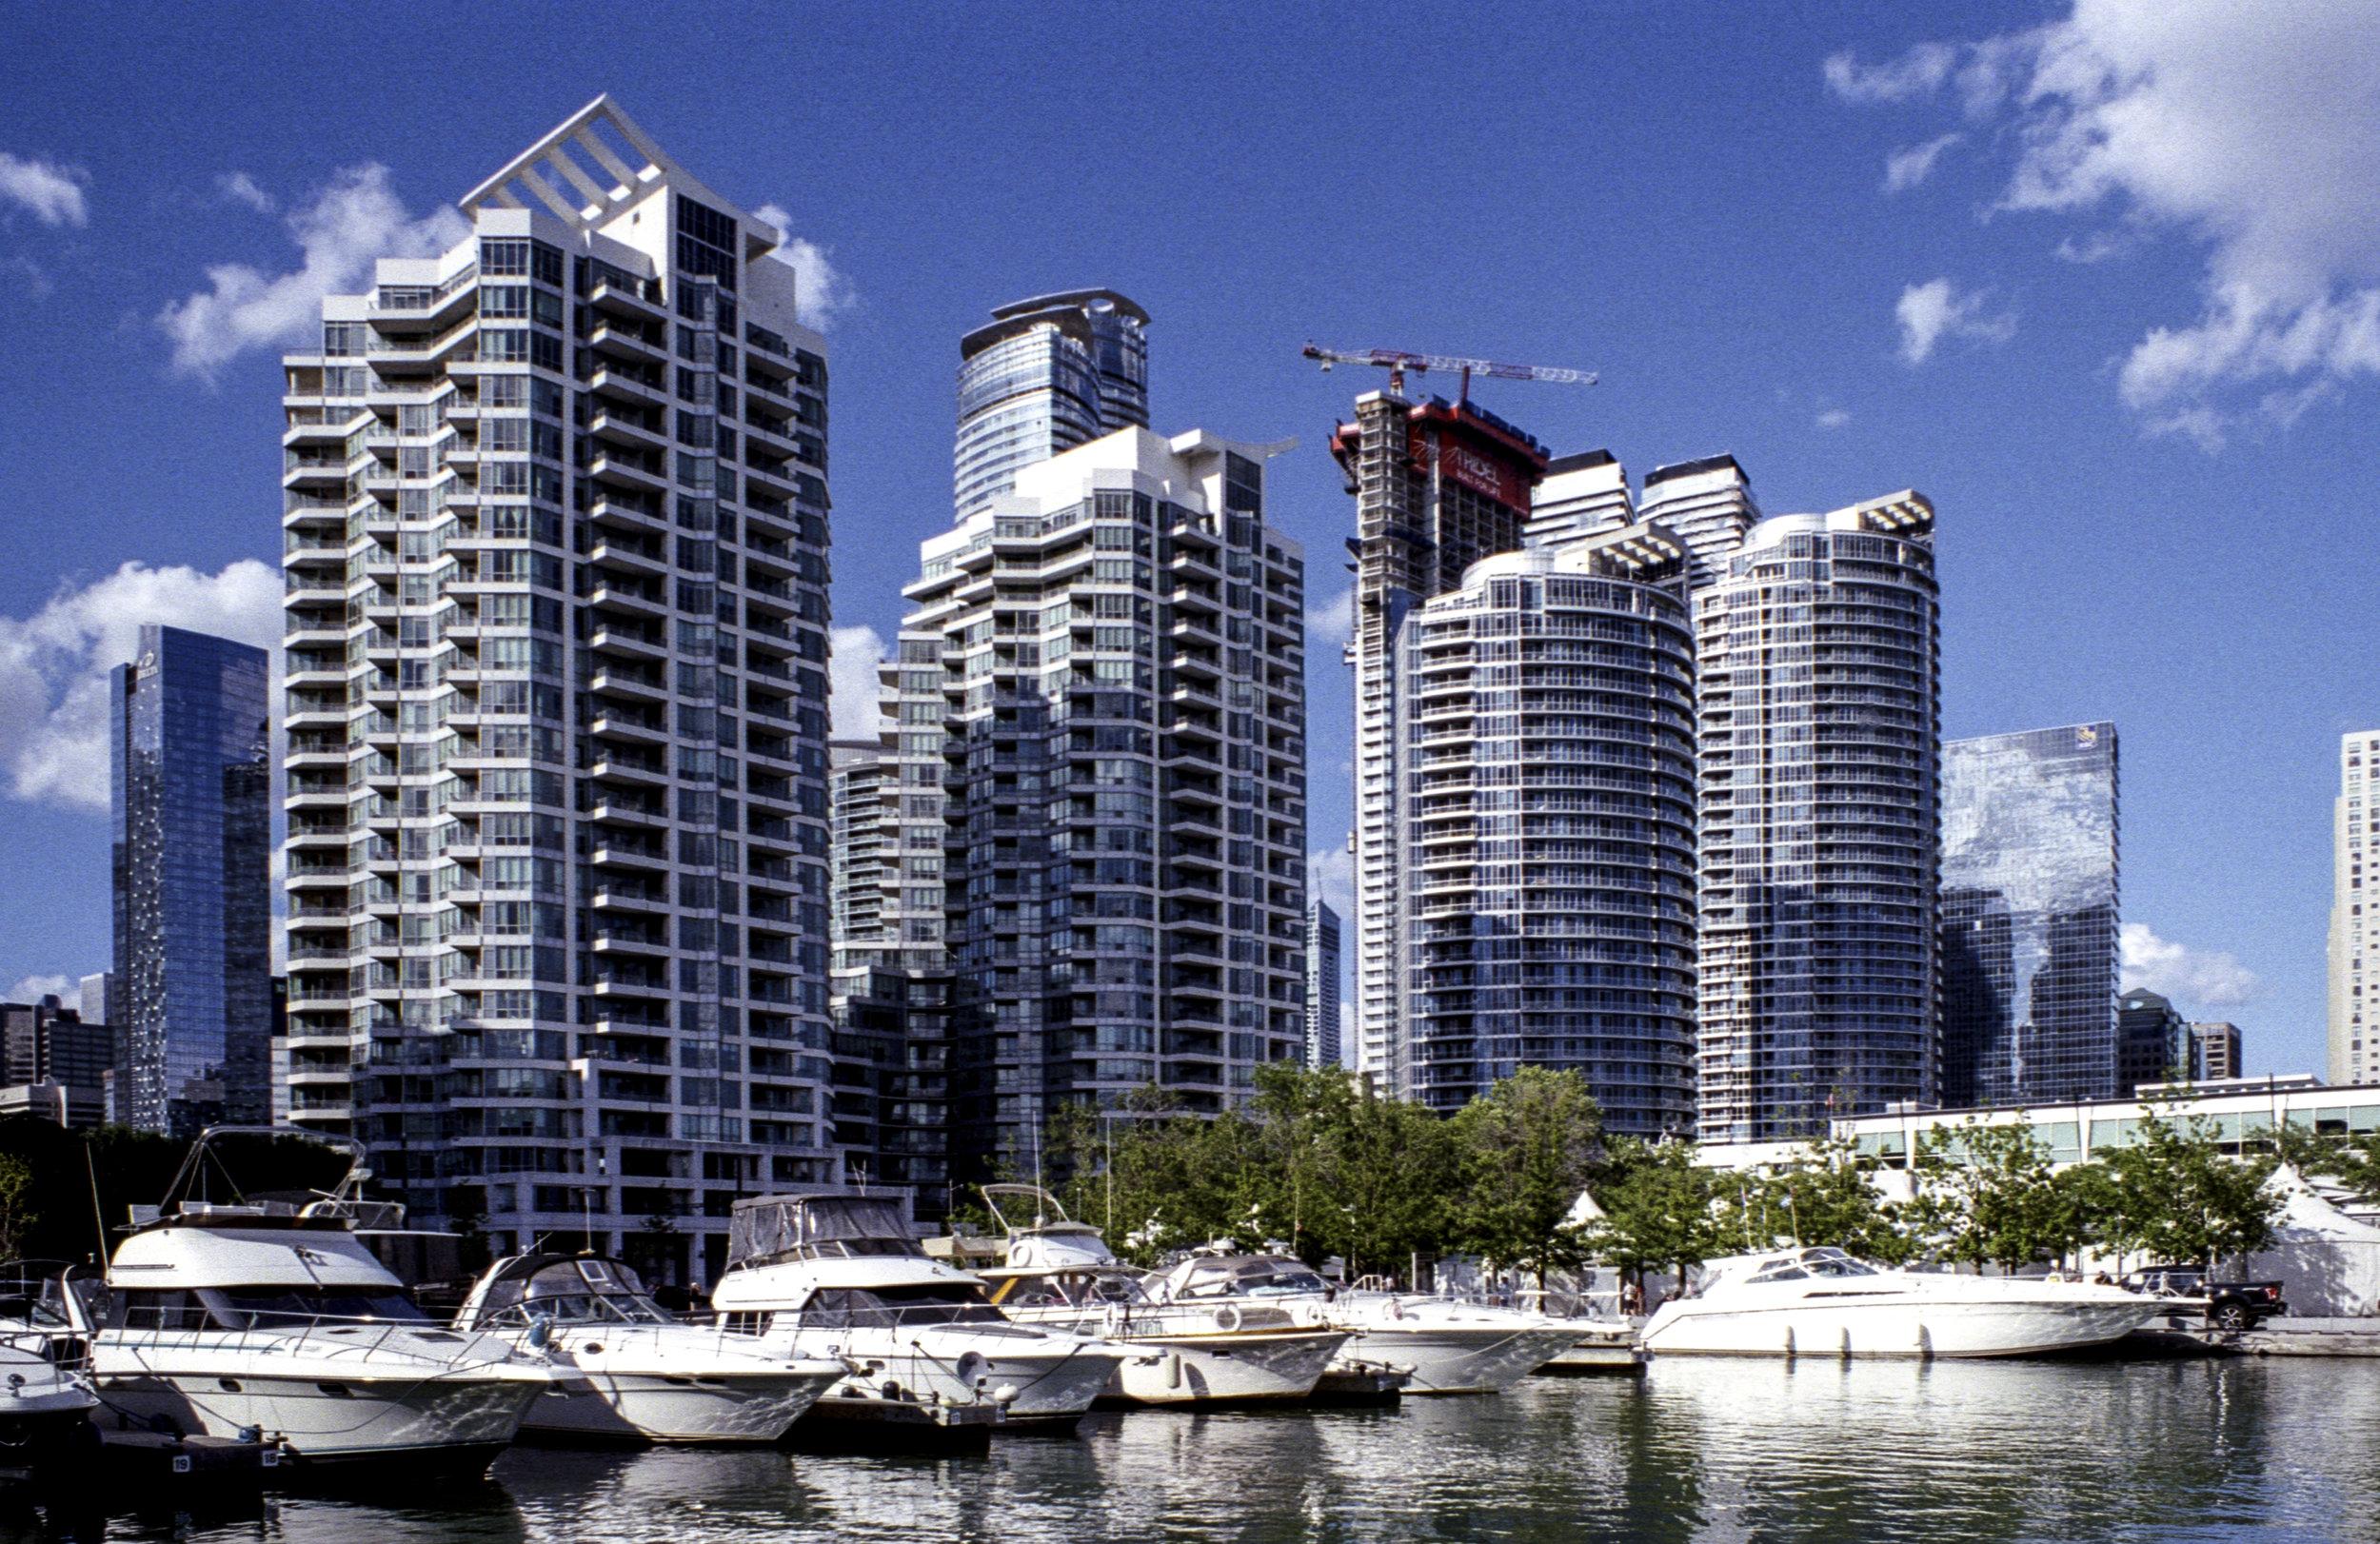 Harbourfront Condos.jpg